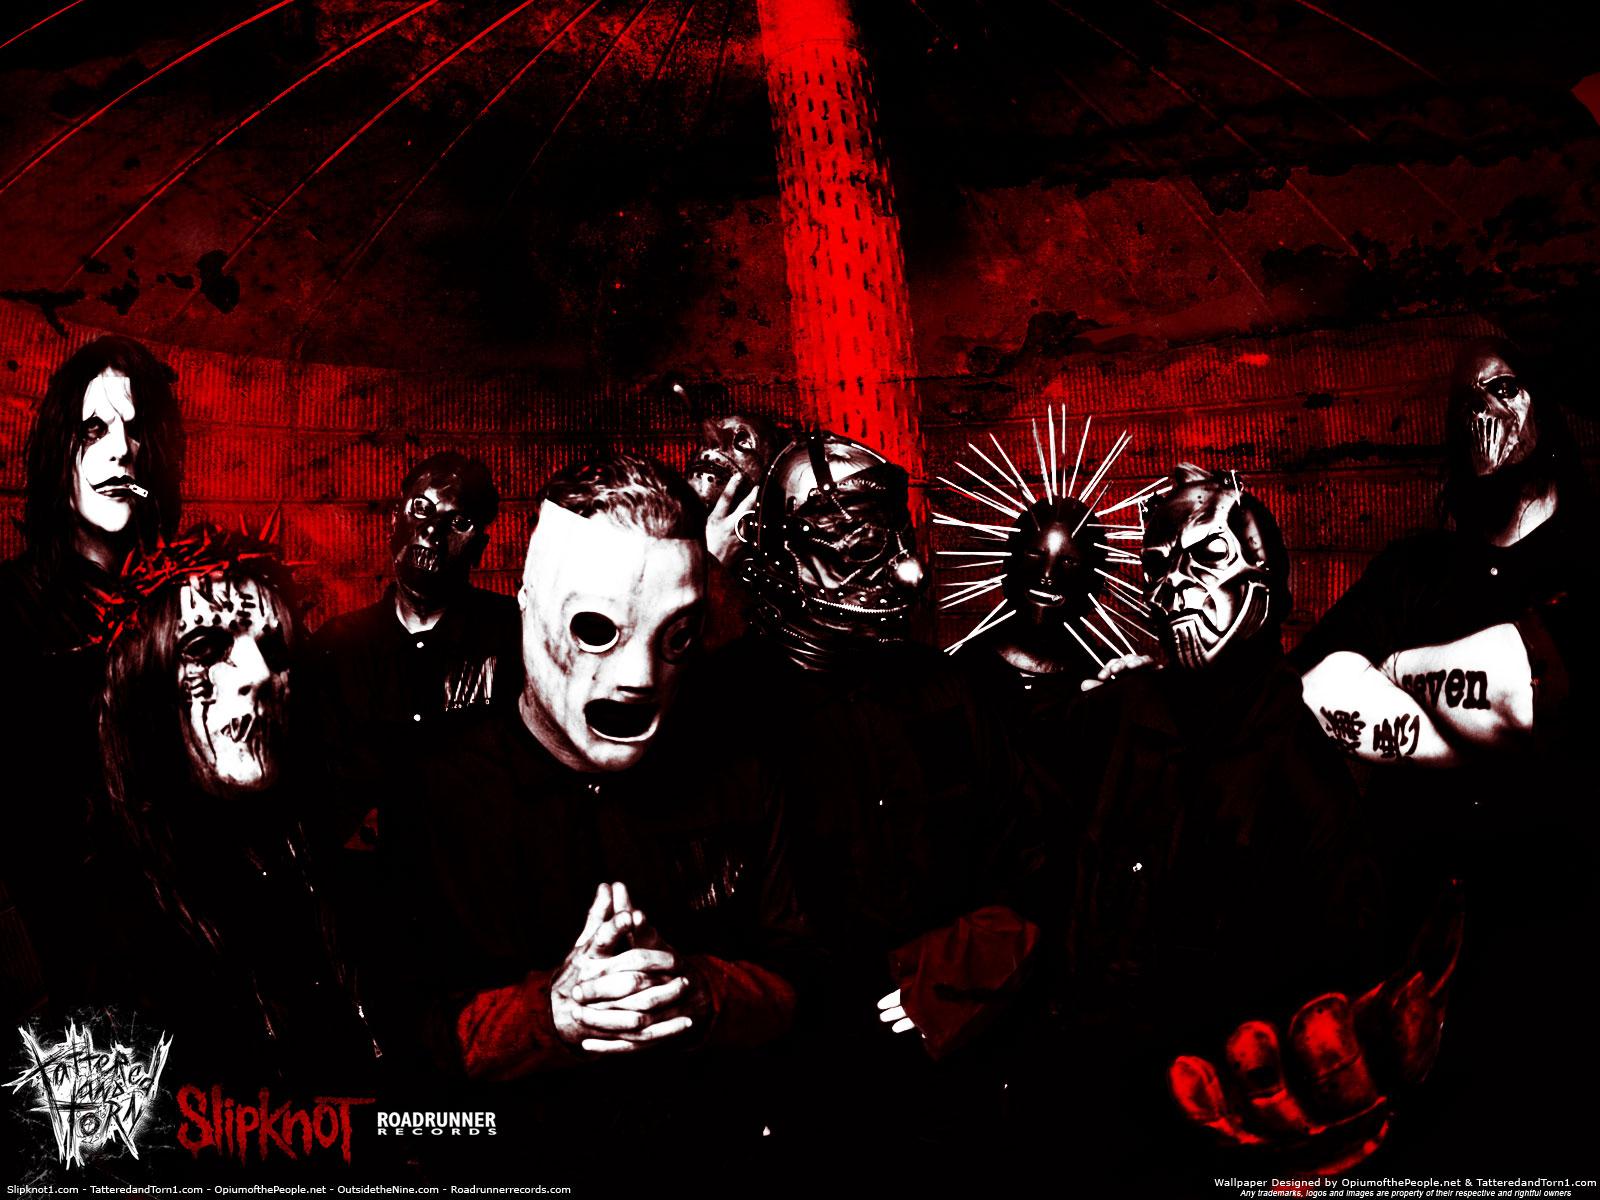 http://2.bp.blogspot.com/-i9AYqBj-qhQ/UGfJUjRPb2I/AAAAAAAAAOs/wyZRC6xVhng/s1600/Slipknot+1.jpg